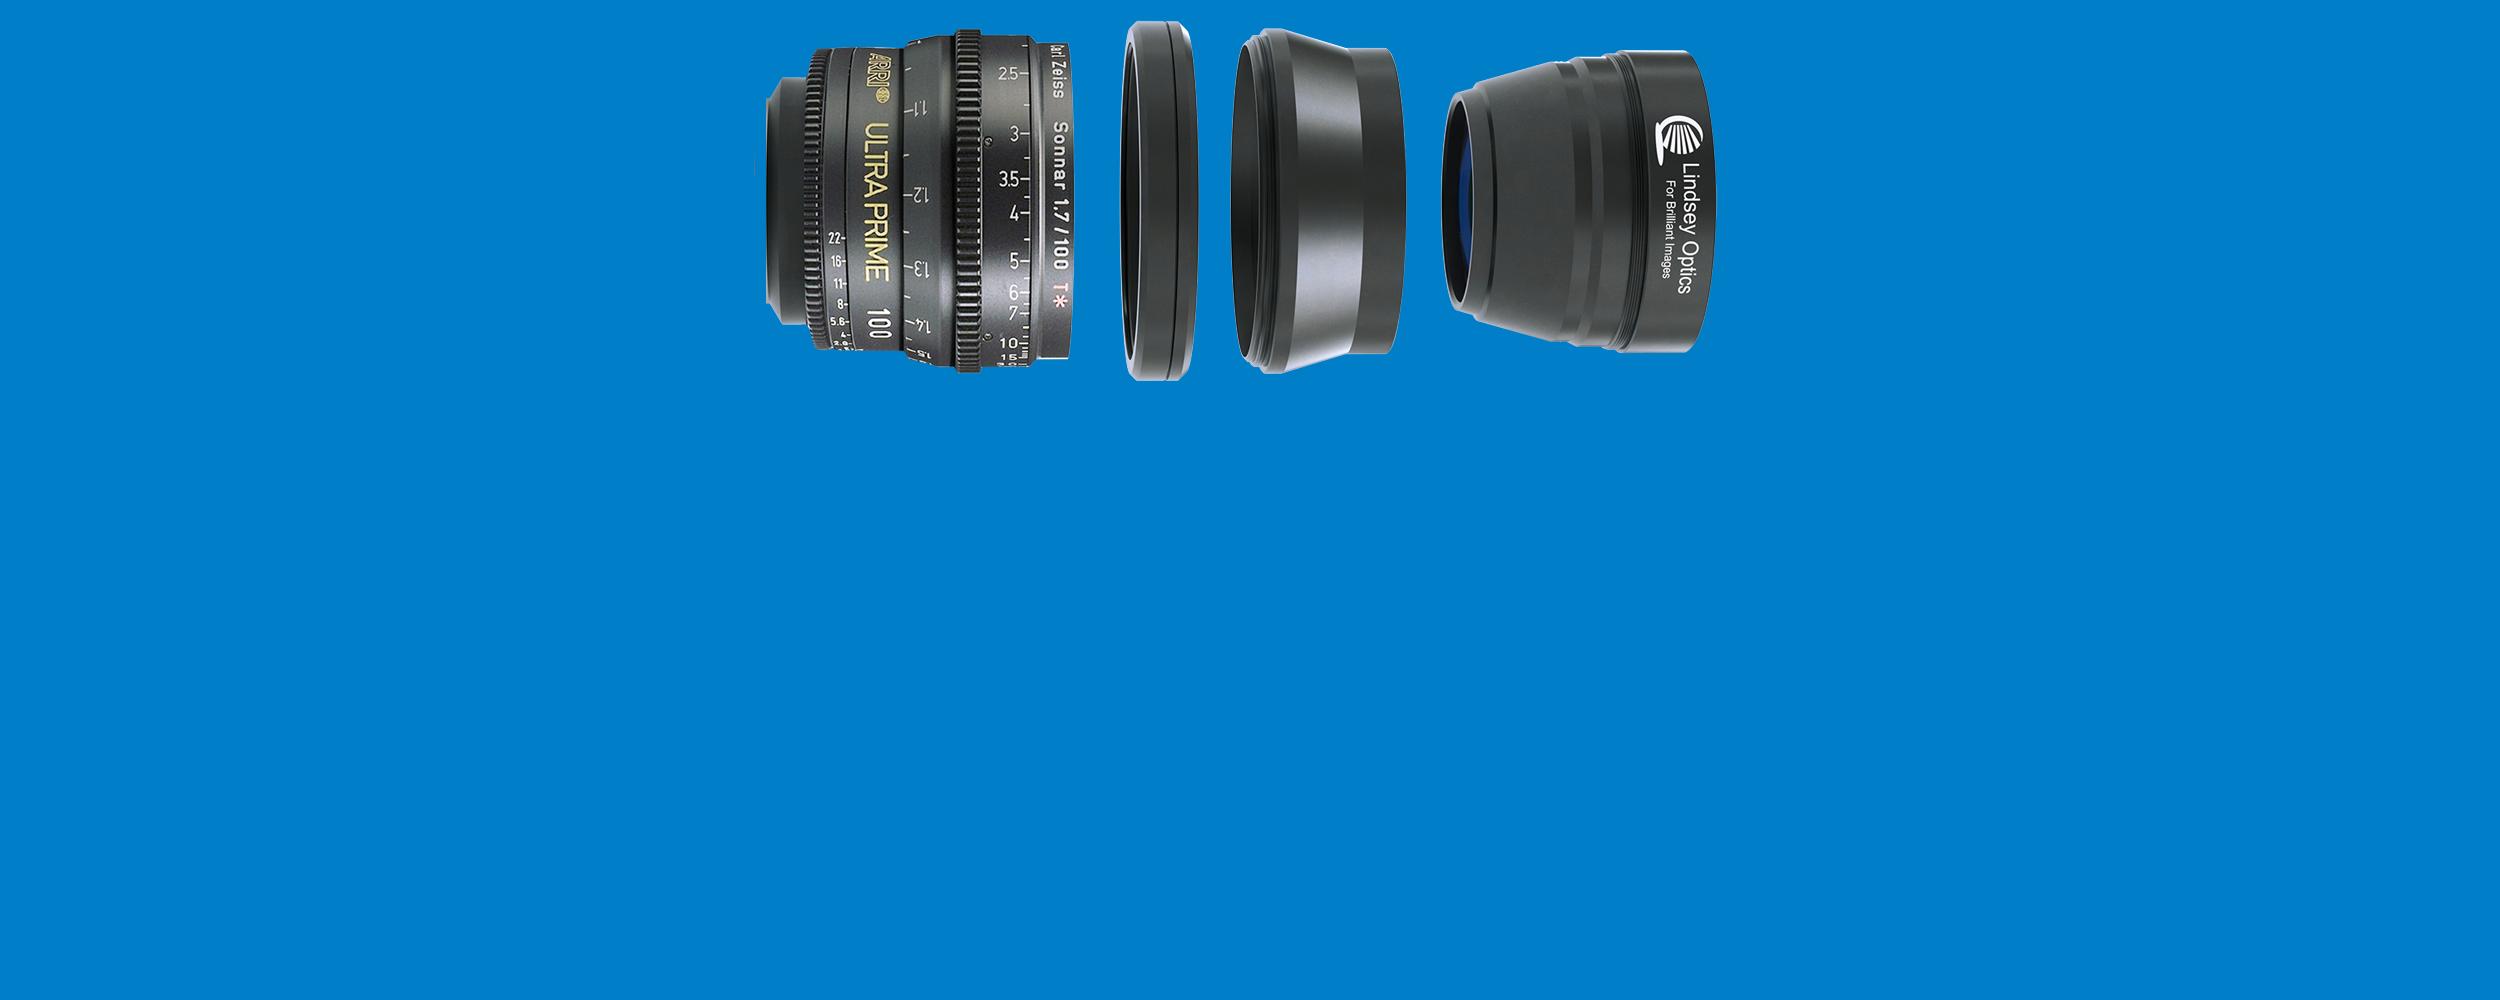 Lindsey Optics Brilliant Macro Attachment Lenses